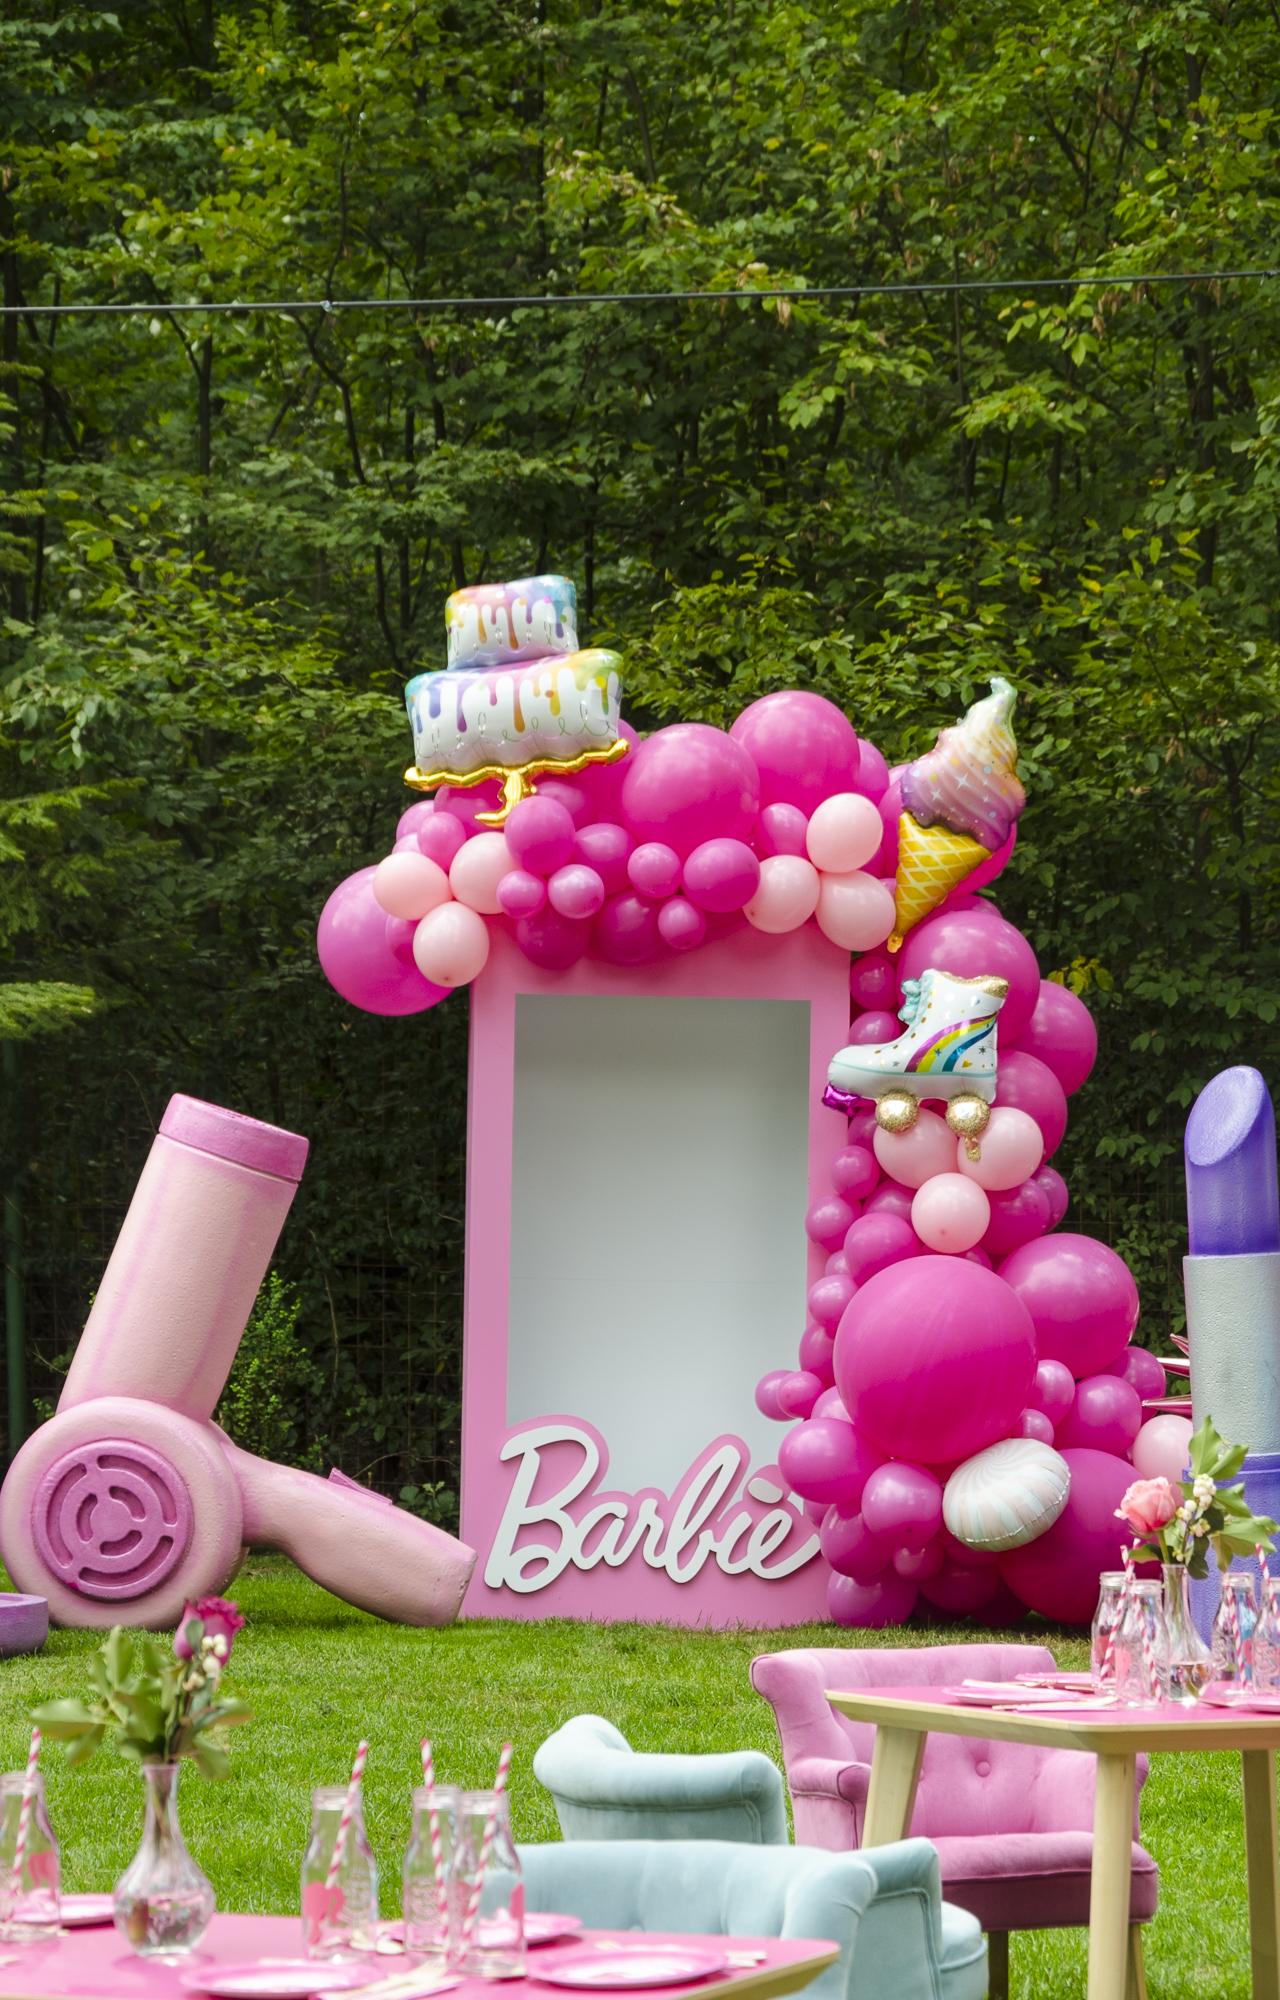 Sandra's Barbie World